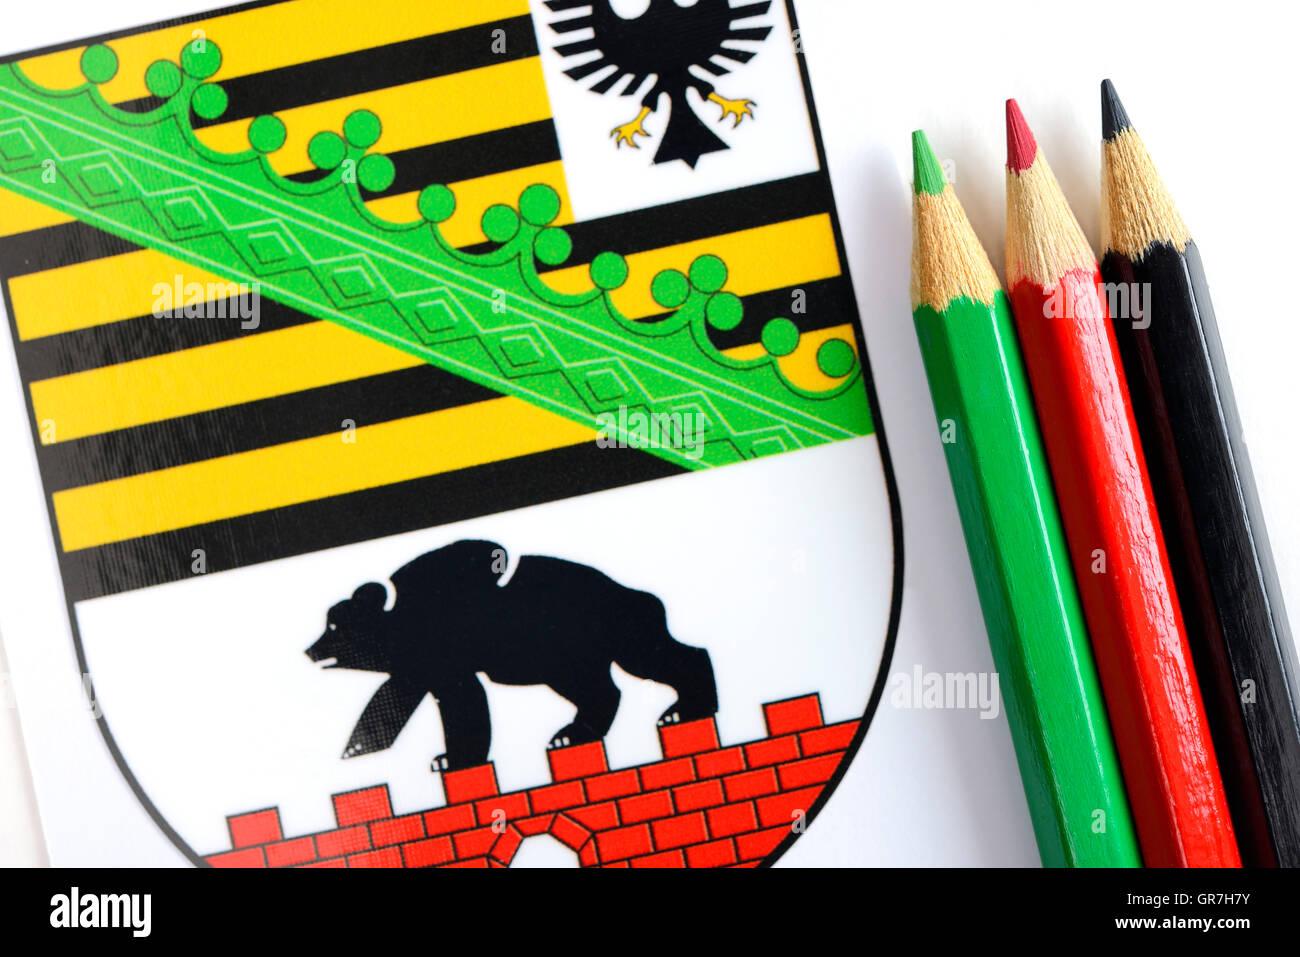 Saxony-Anhalt, Black-Red-Green Coalition - Stock Image